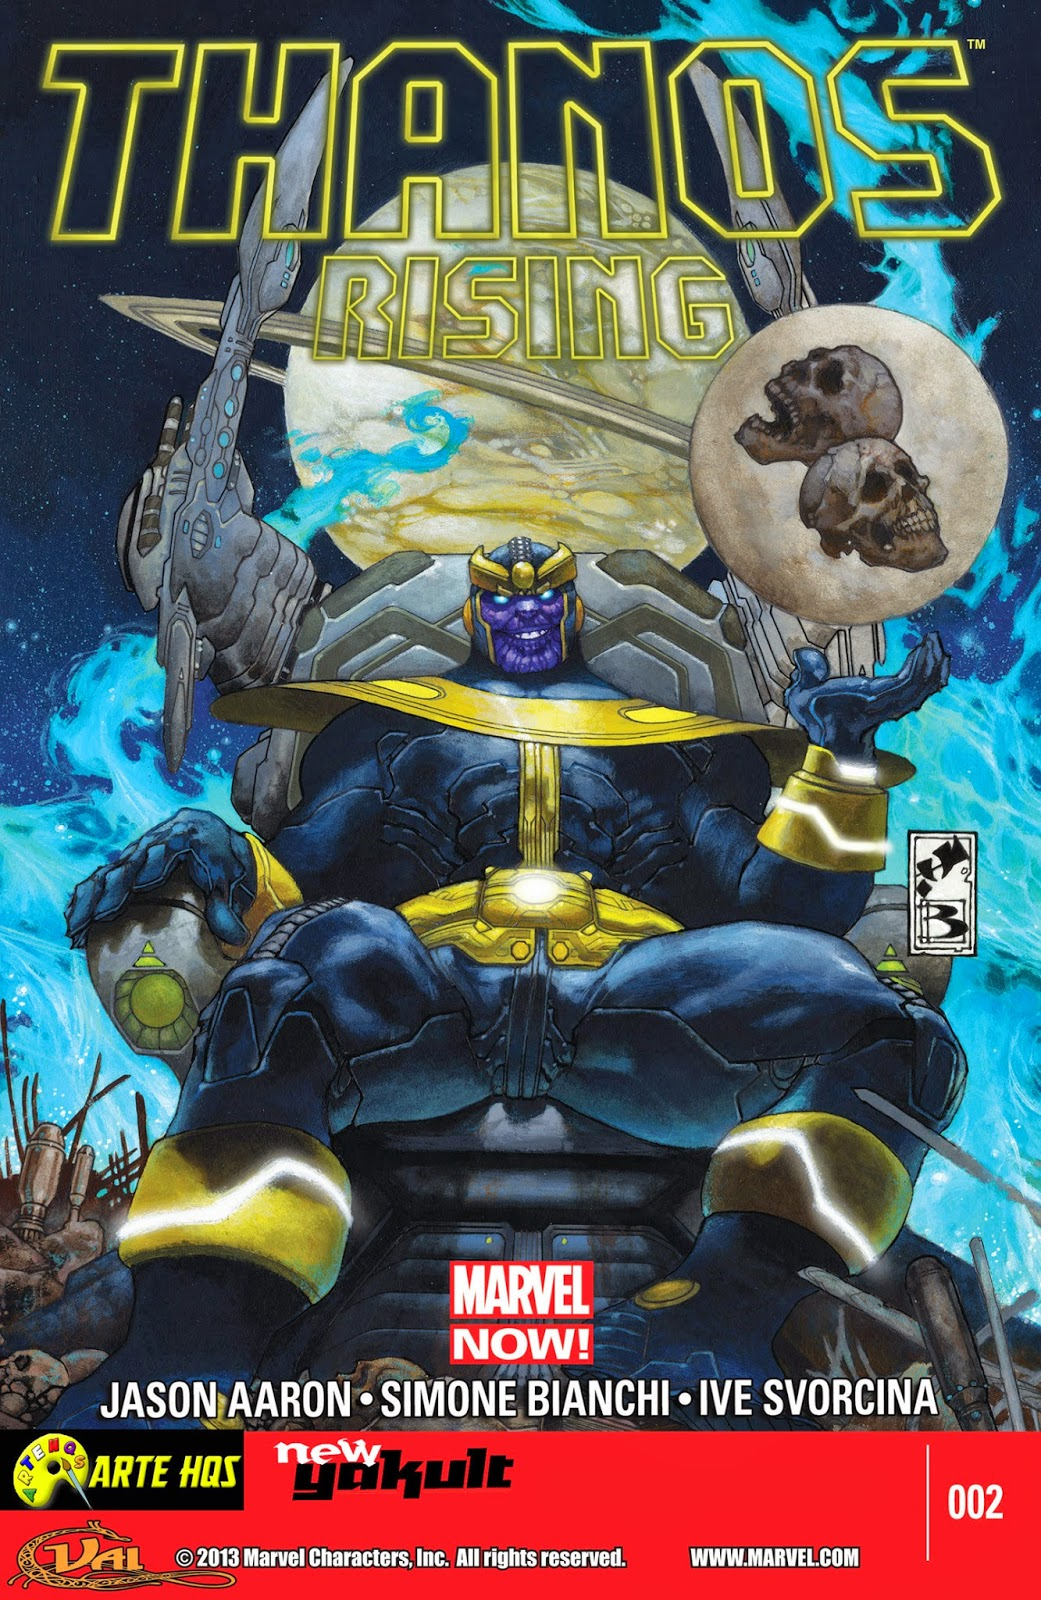 Nova Marvel! Thanos Rising #2